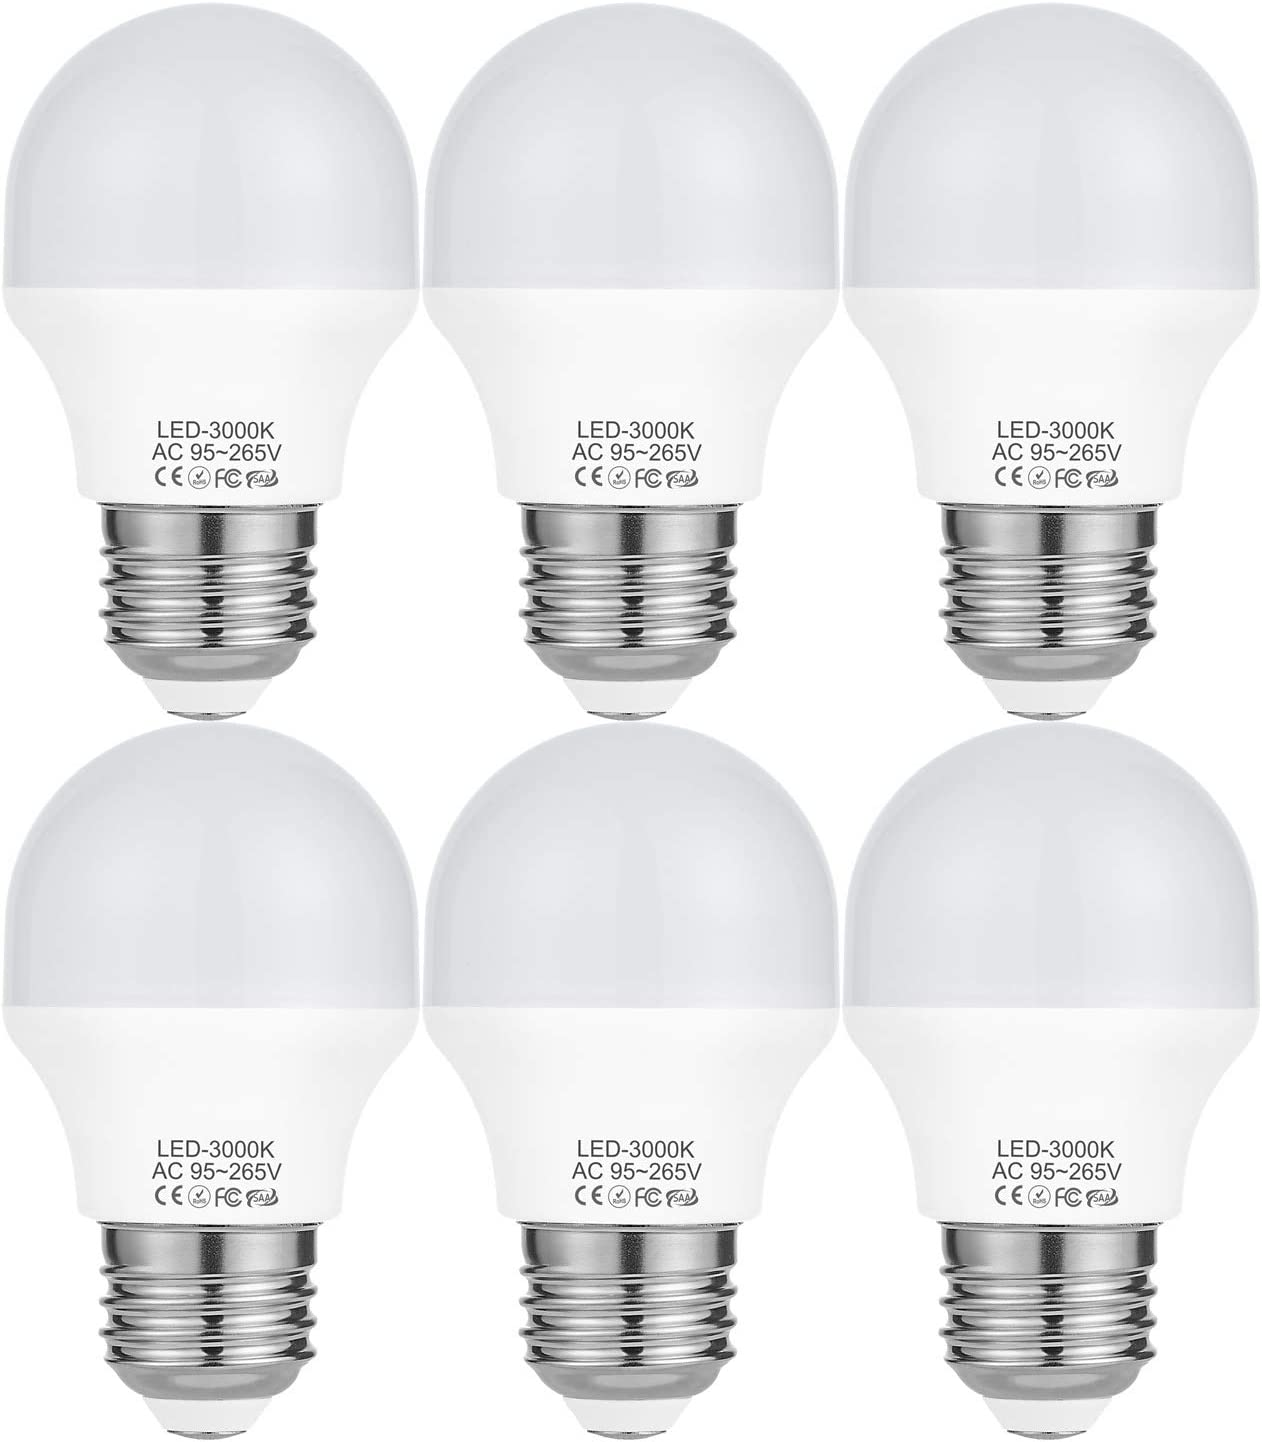 4W LED A15 Light Bulb(40Watt Equivalent),E26 Medium Base LED Flood Bulb G50 Bulbs,3000K Soft White LED Bulbs Not Dimmable 120Volt 360Lumens-6 Pack